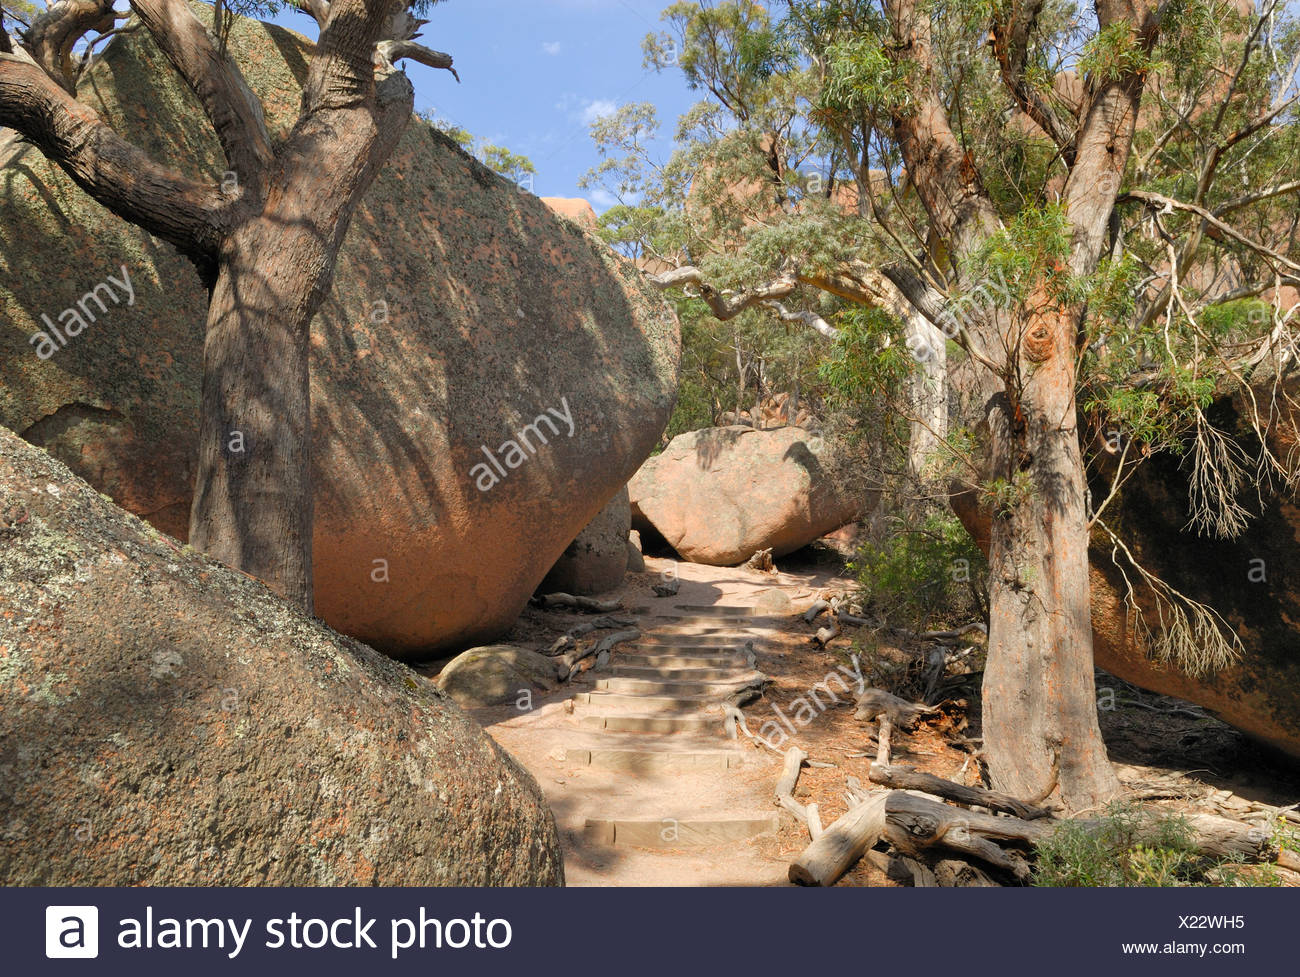 Hiking between large granite boulders to the Hazards, Freycinet Peninsula, Tasmania, Australia - Stock Image